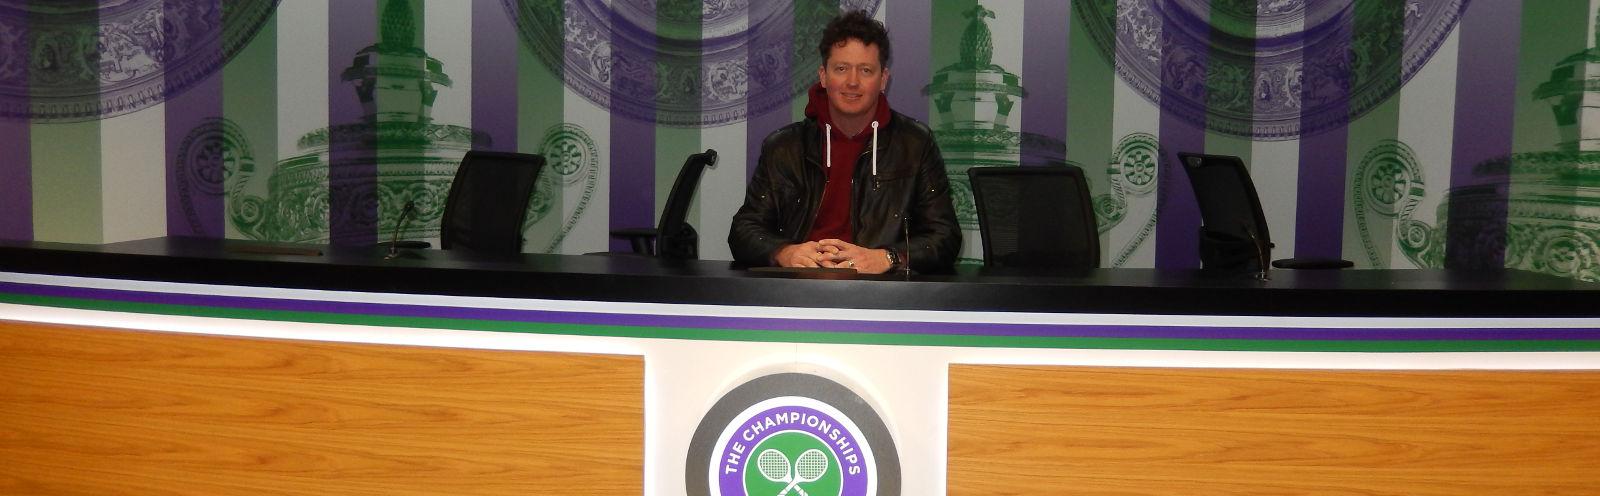 christian kozik tennis professional